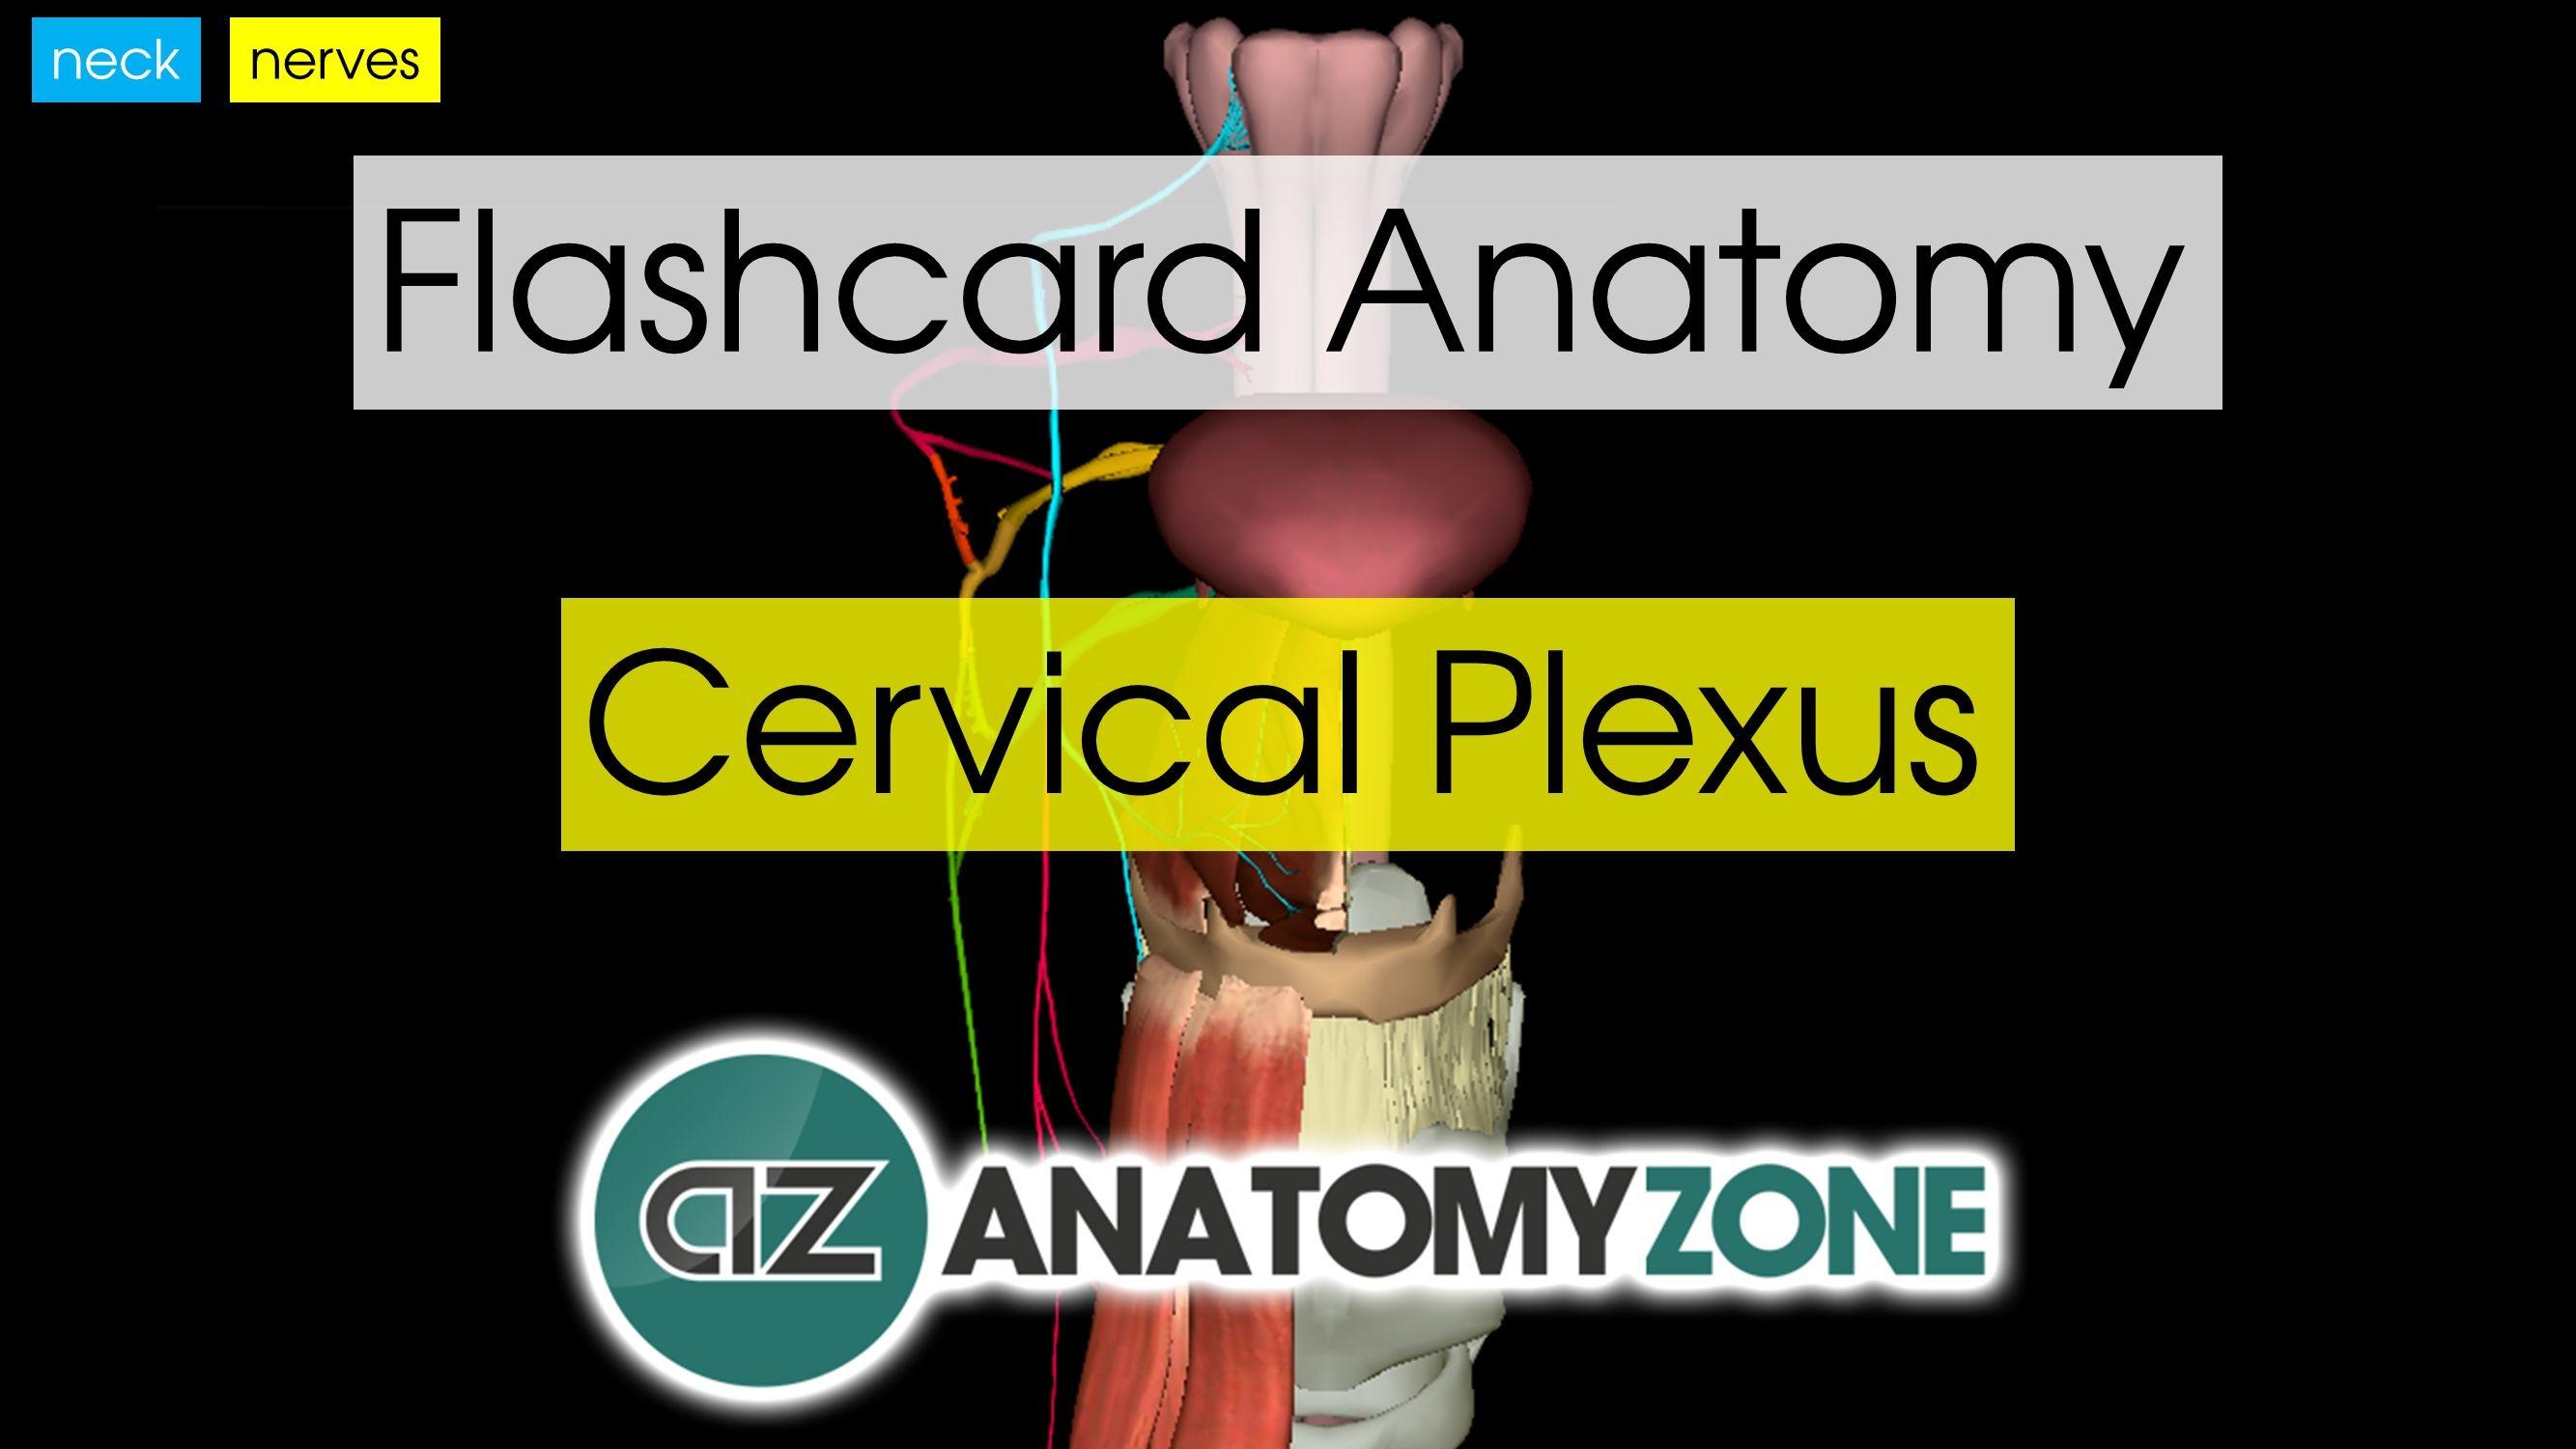 Flashcards • Anatomyzone - Free Printable Muscle Flashcards